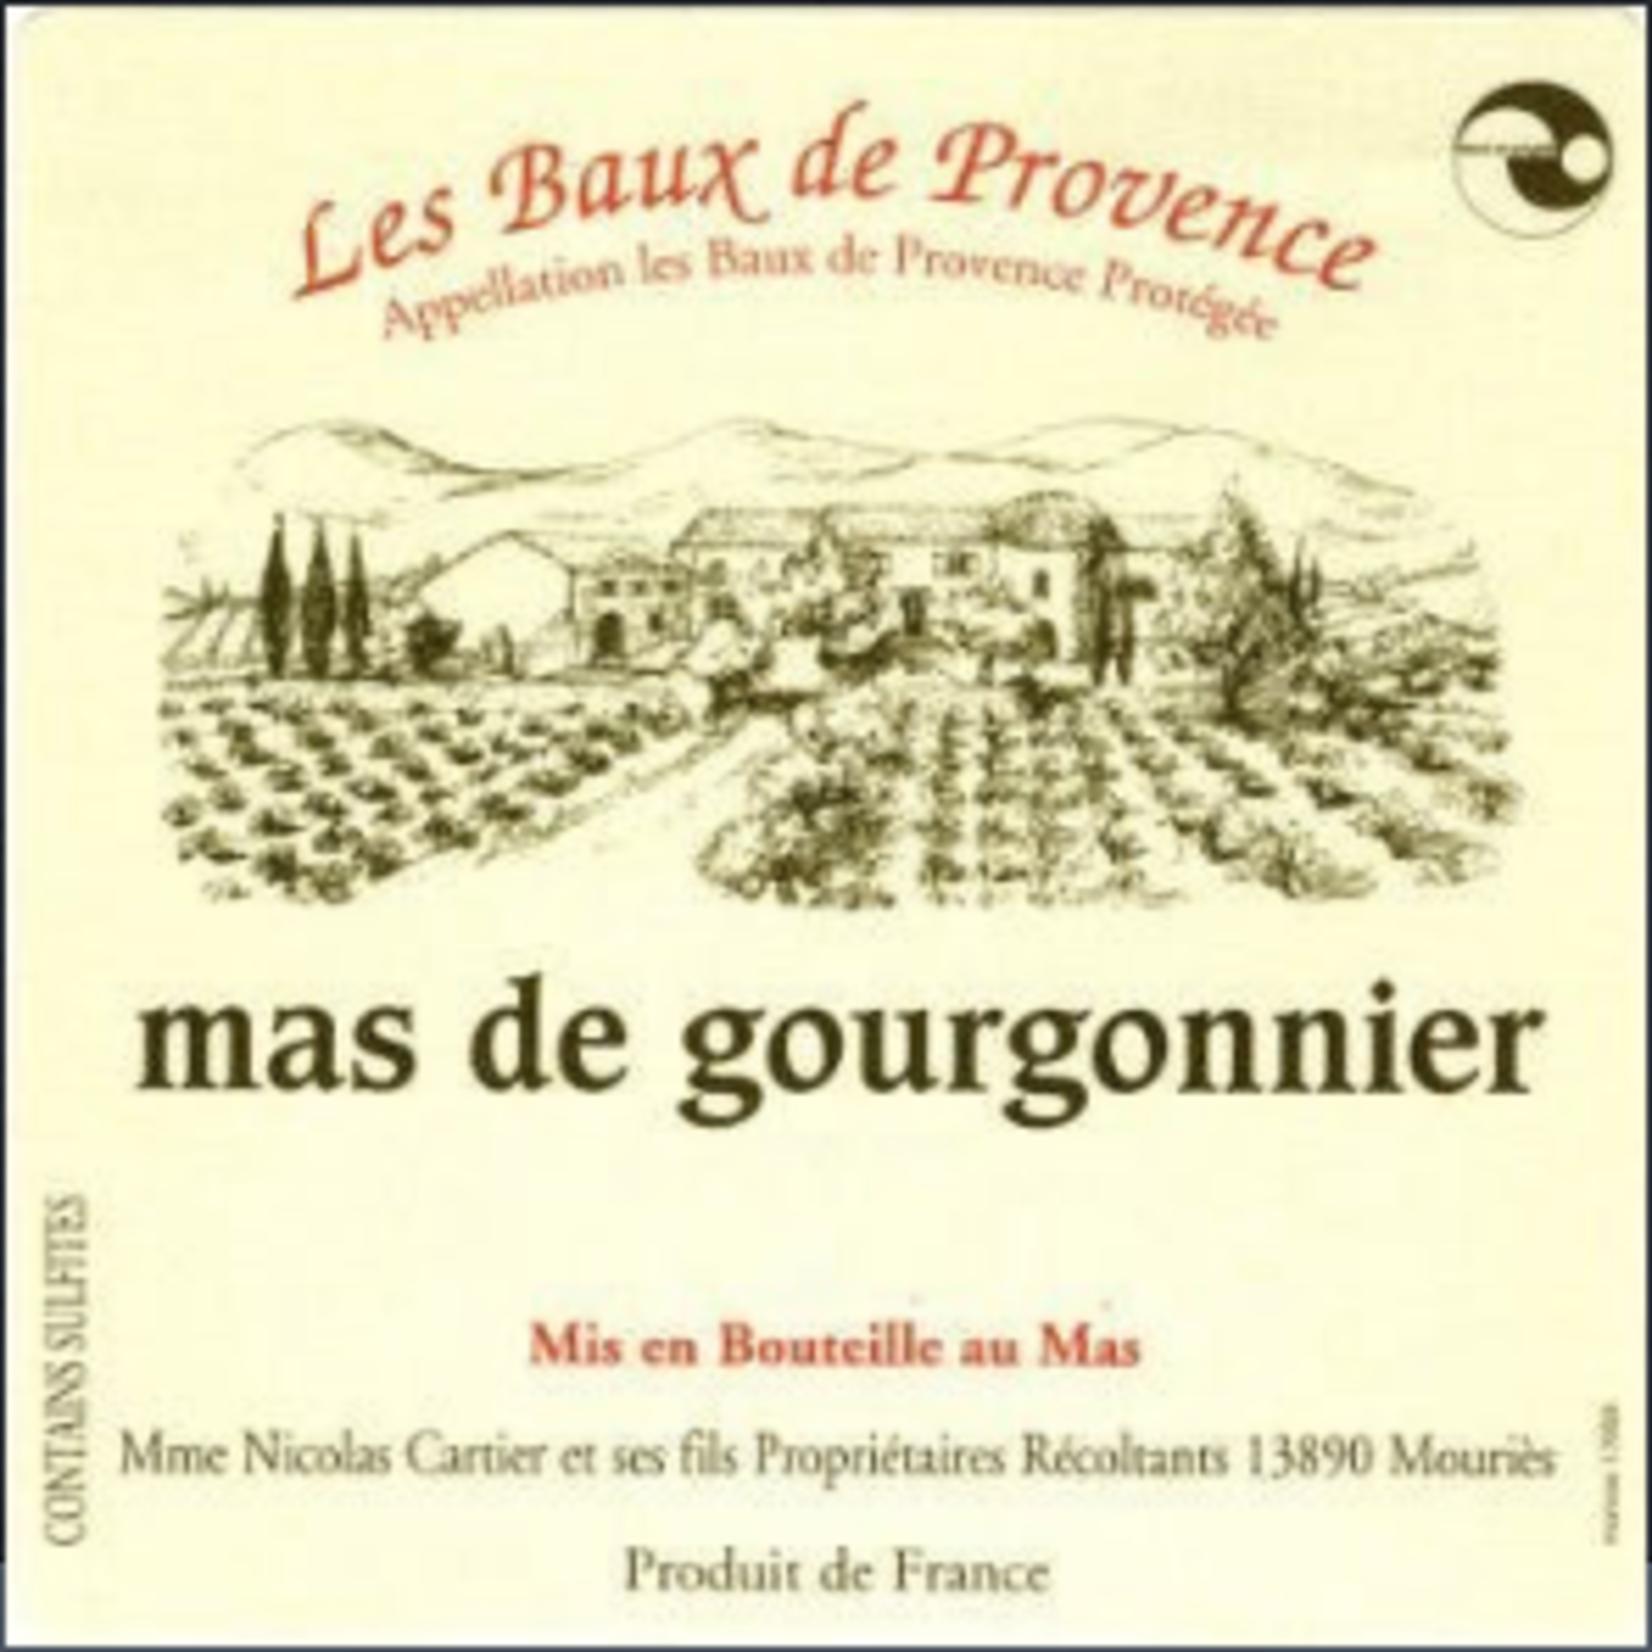 Mas de Gourgonnier Mas de Gourgonnier Rose 2020 ORGANIC    Provence, France